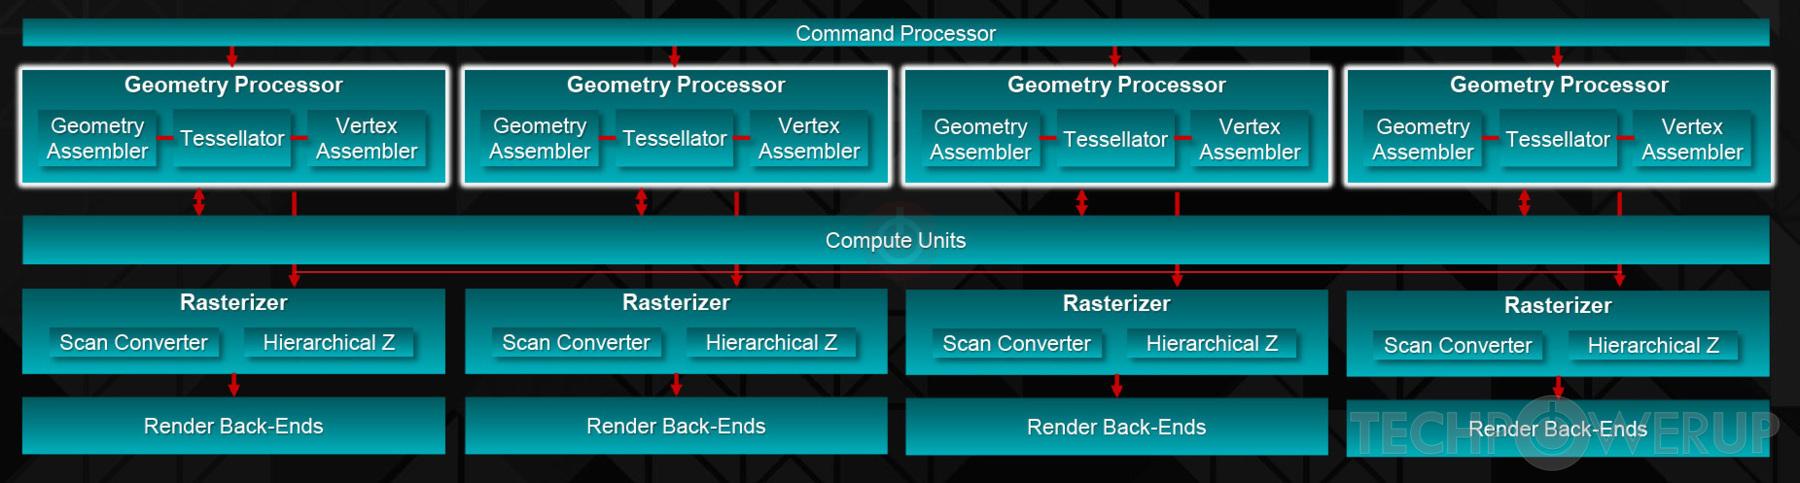 AMD Fiji GPU Specs | TechPowerUp GPU Database